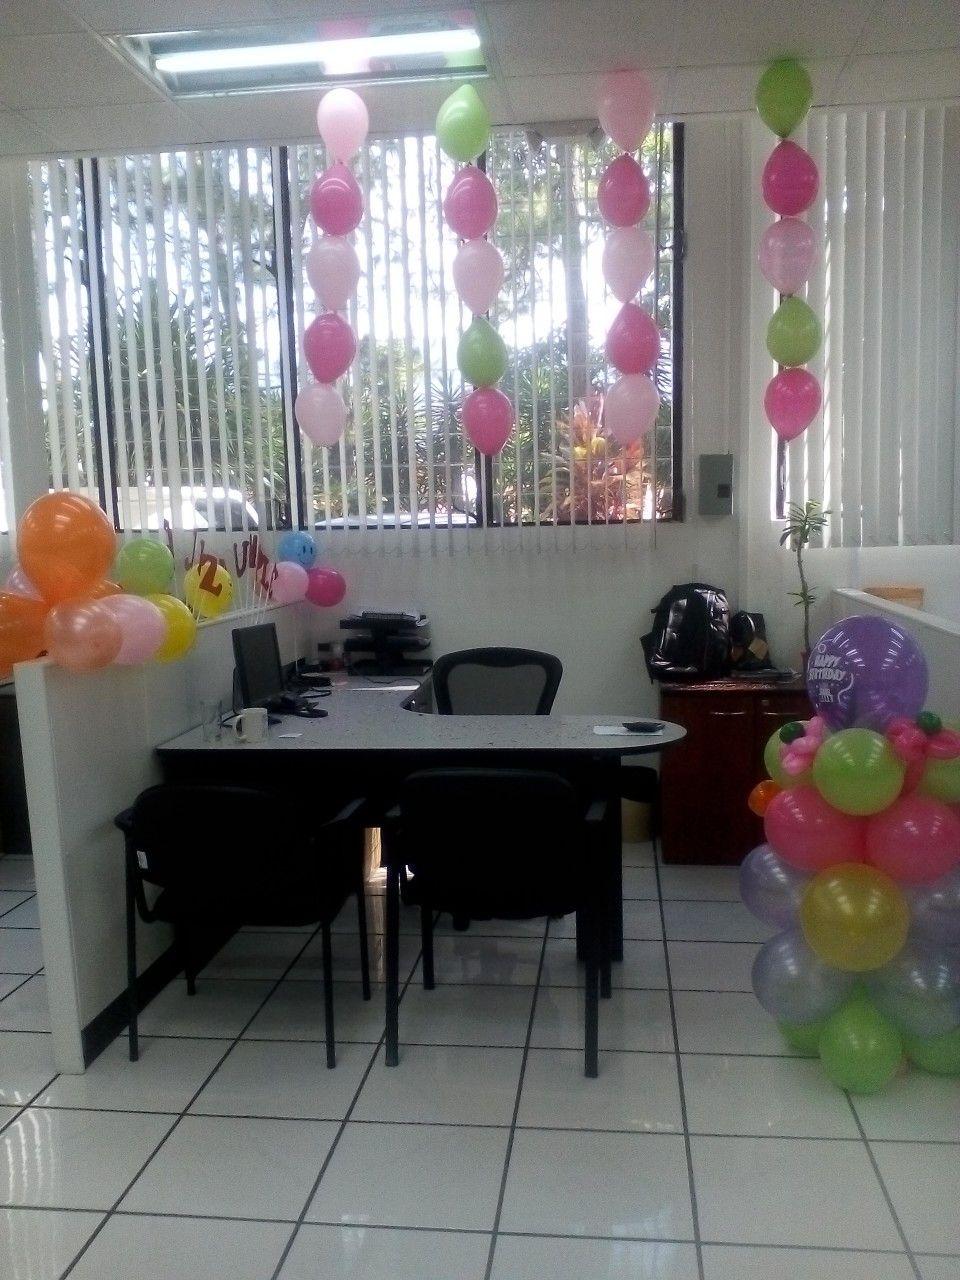 Decoraci n oficina cumplea os decoraciones decorar for Decoracion para oficina